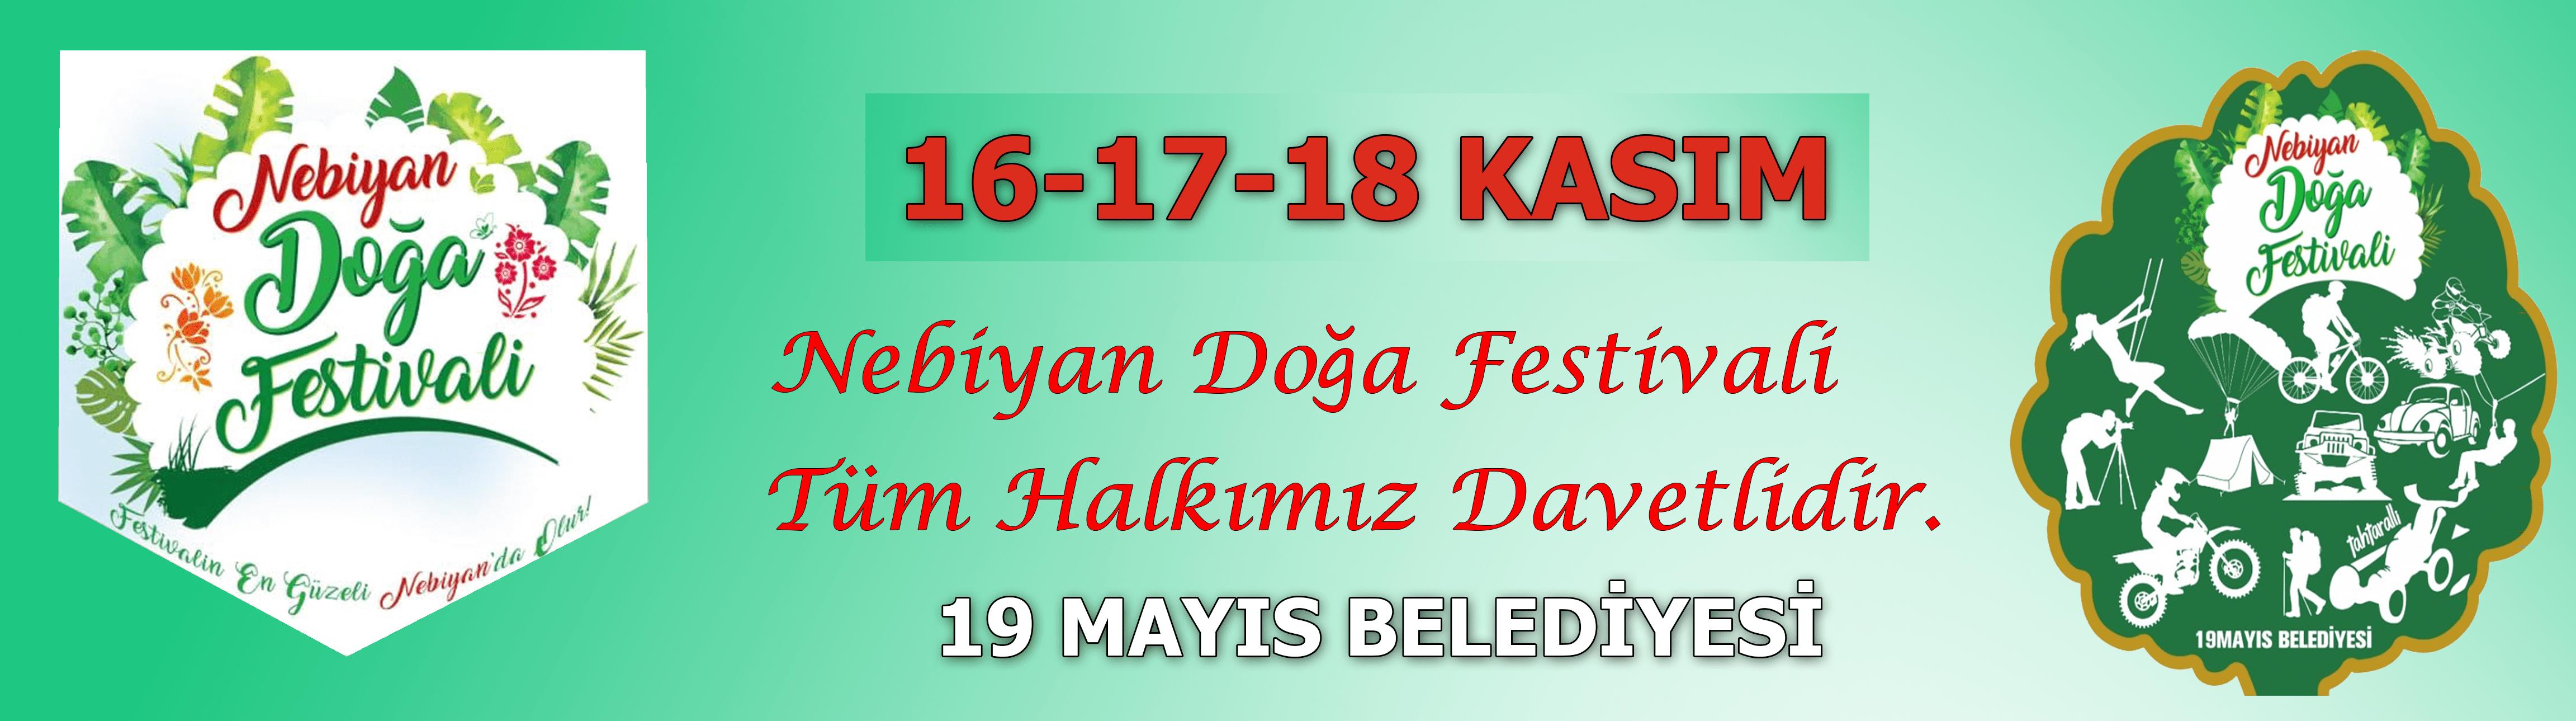 nebiya doğa festivali - nebiya doğa festivali